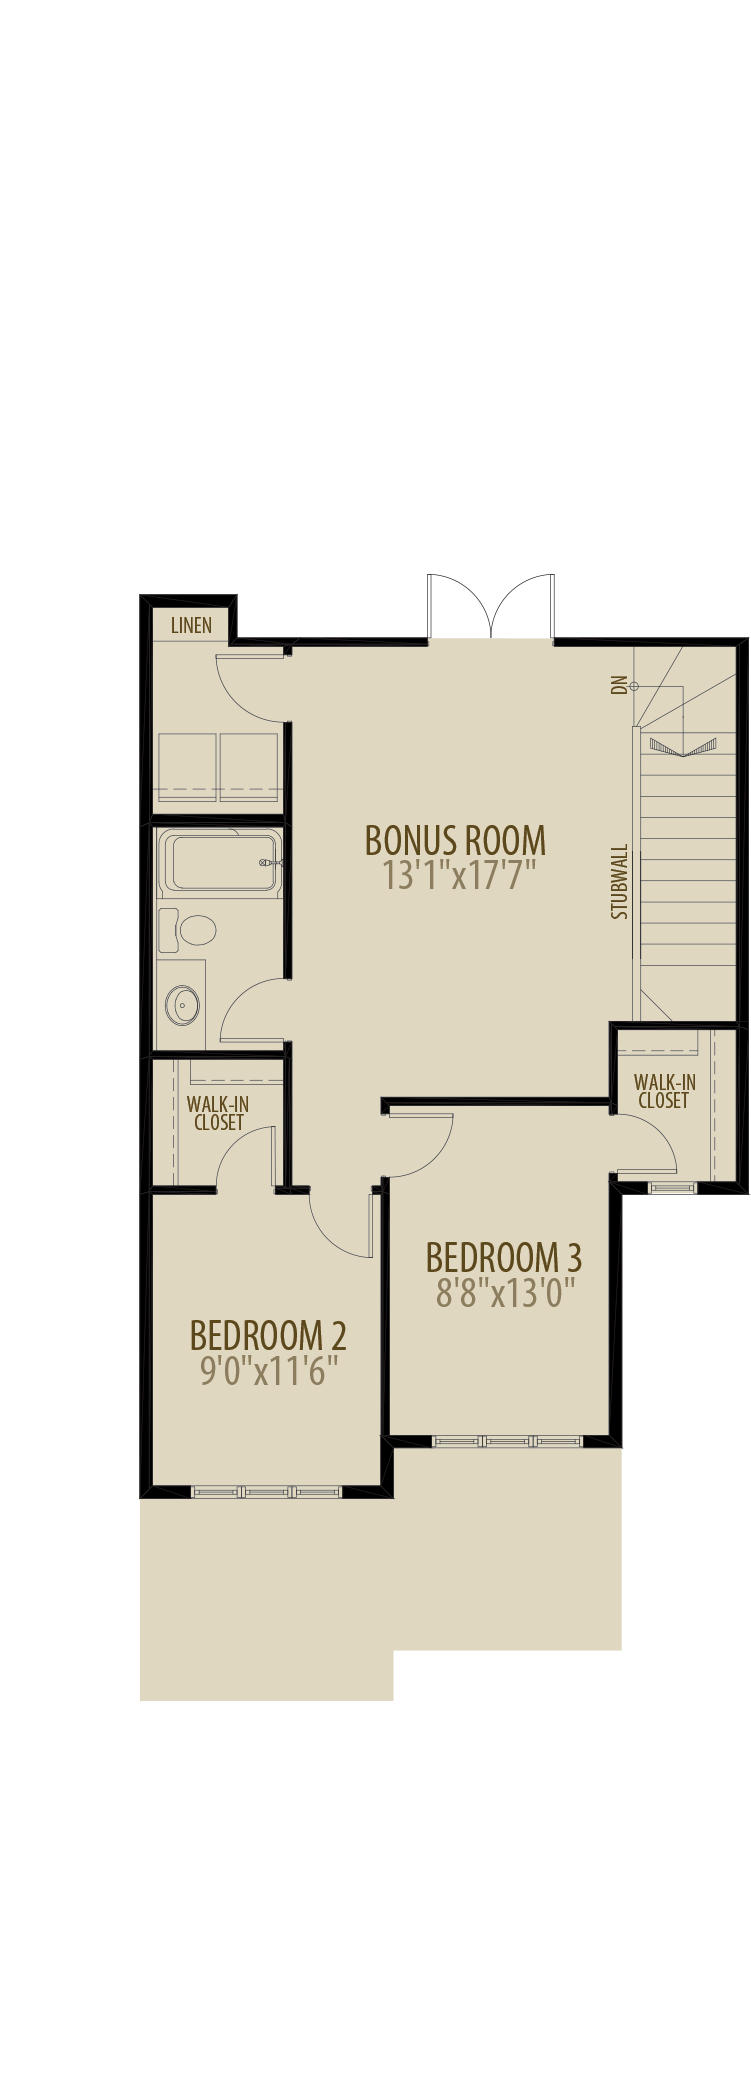 Extended Upper Floor (Adds 57 SQ FT)